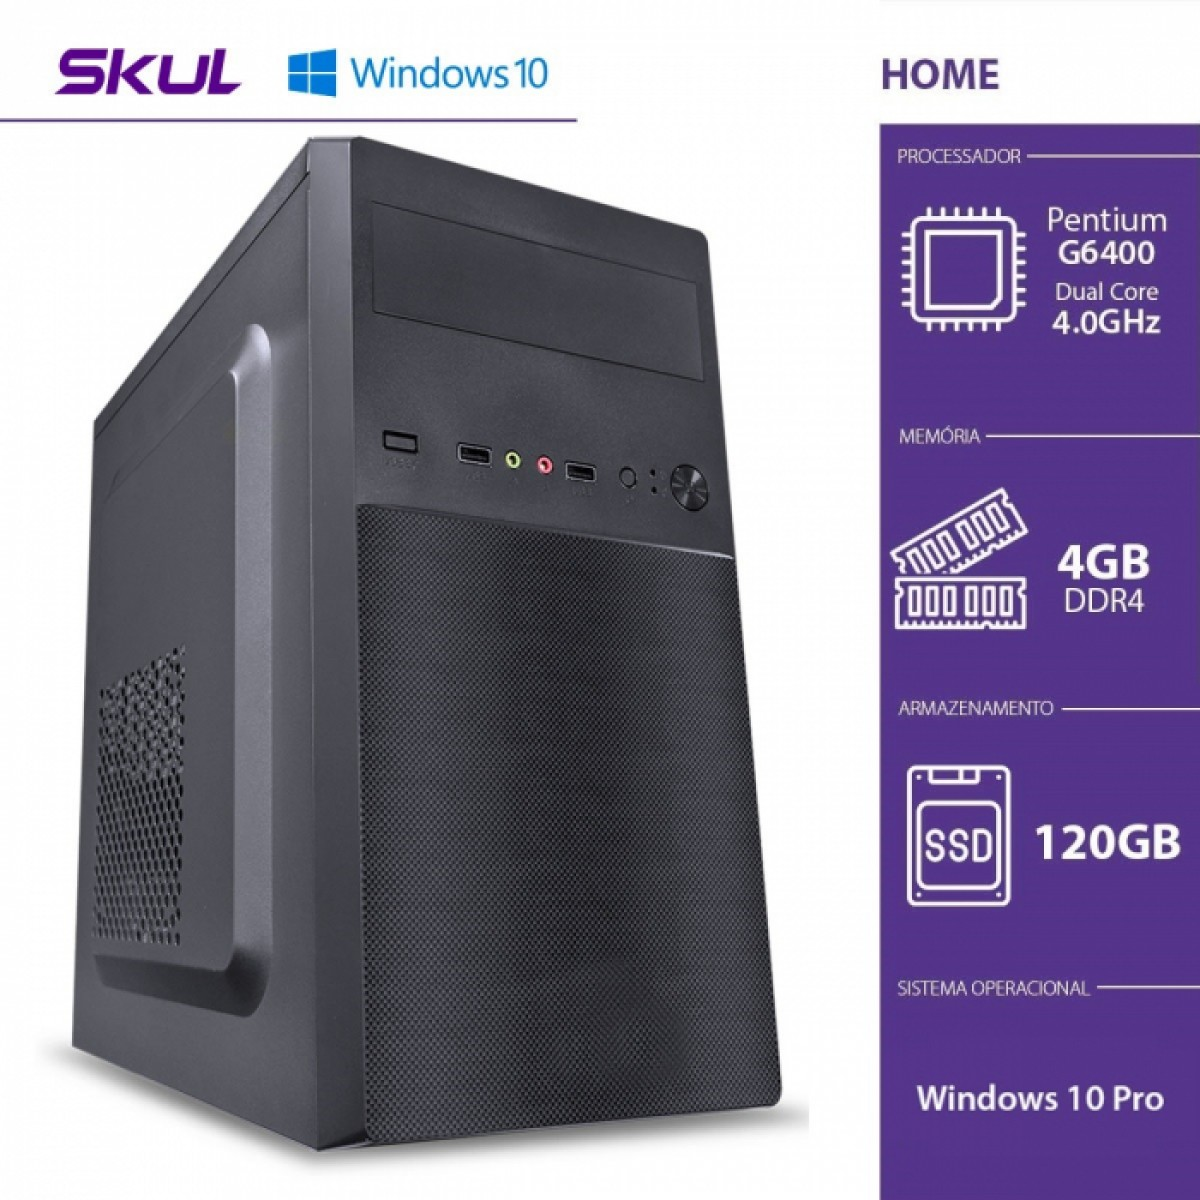 Computador Skul T-Home H200 PENTIUM DUAL CORE G6400 / 4GB DDR4 / SSD 120GB / HDMI/VGA / FONTE 200W / Windows 10 Pro